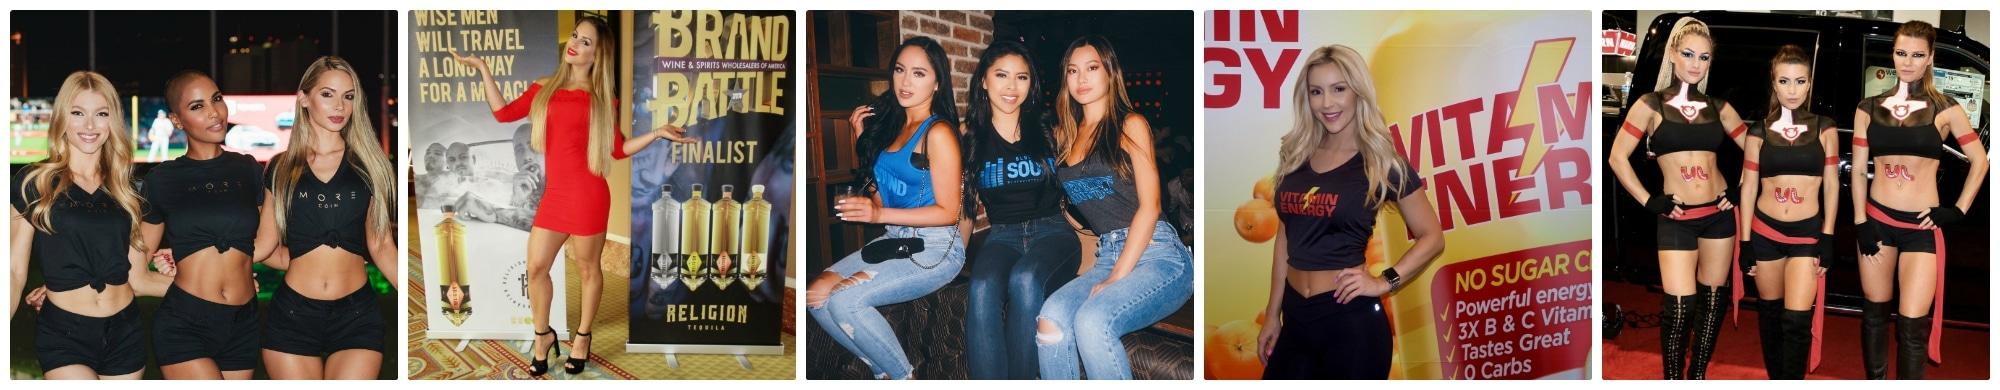 Legend Models Brand Ambassadors Las Vegas